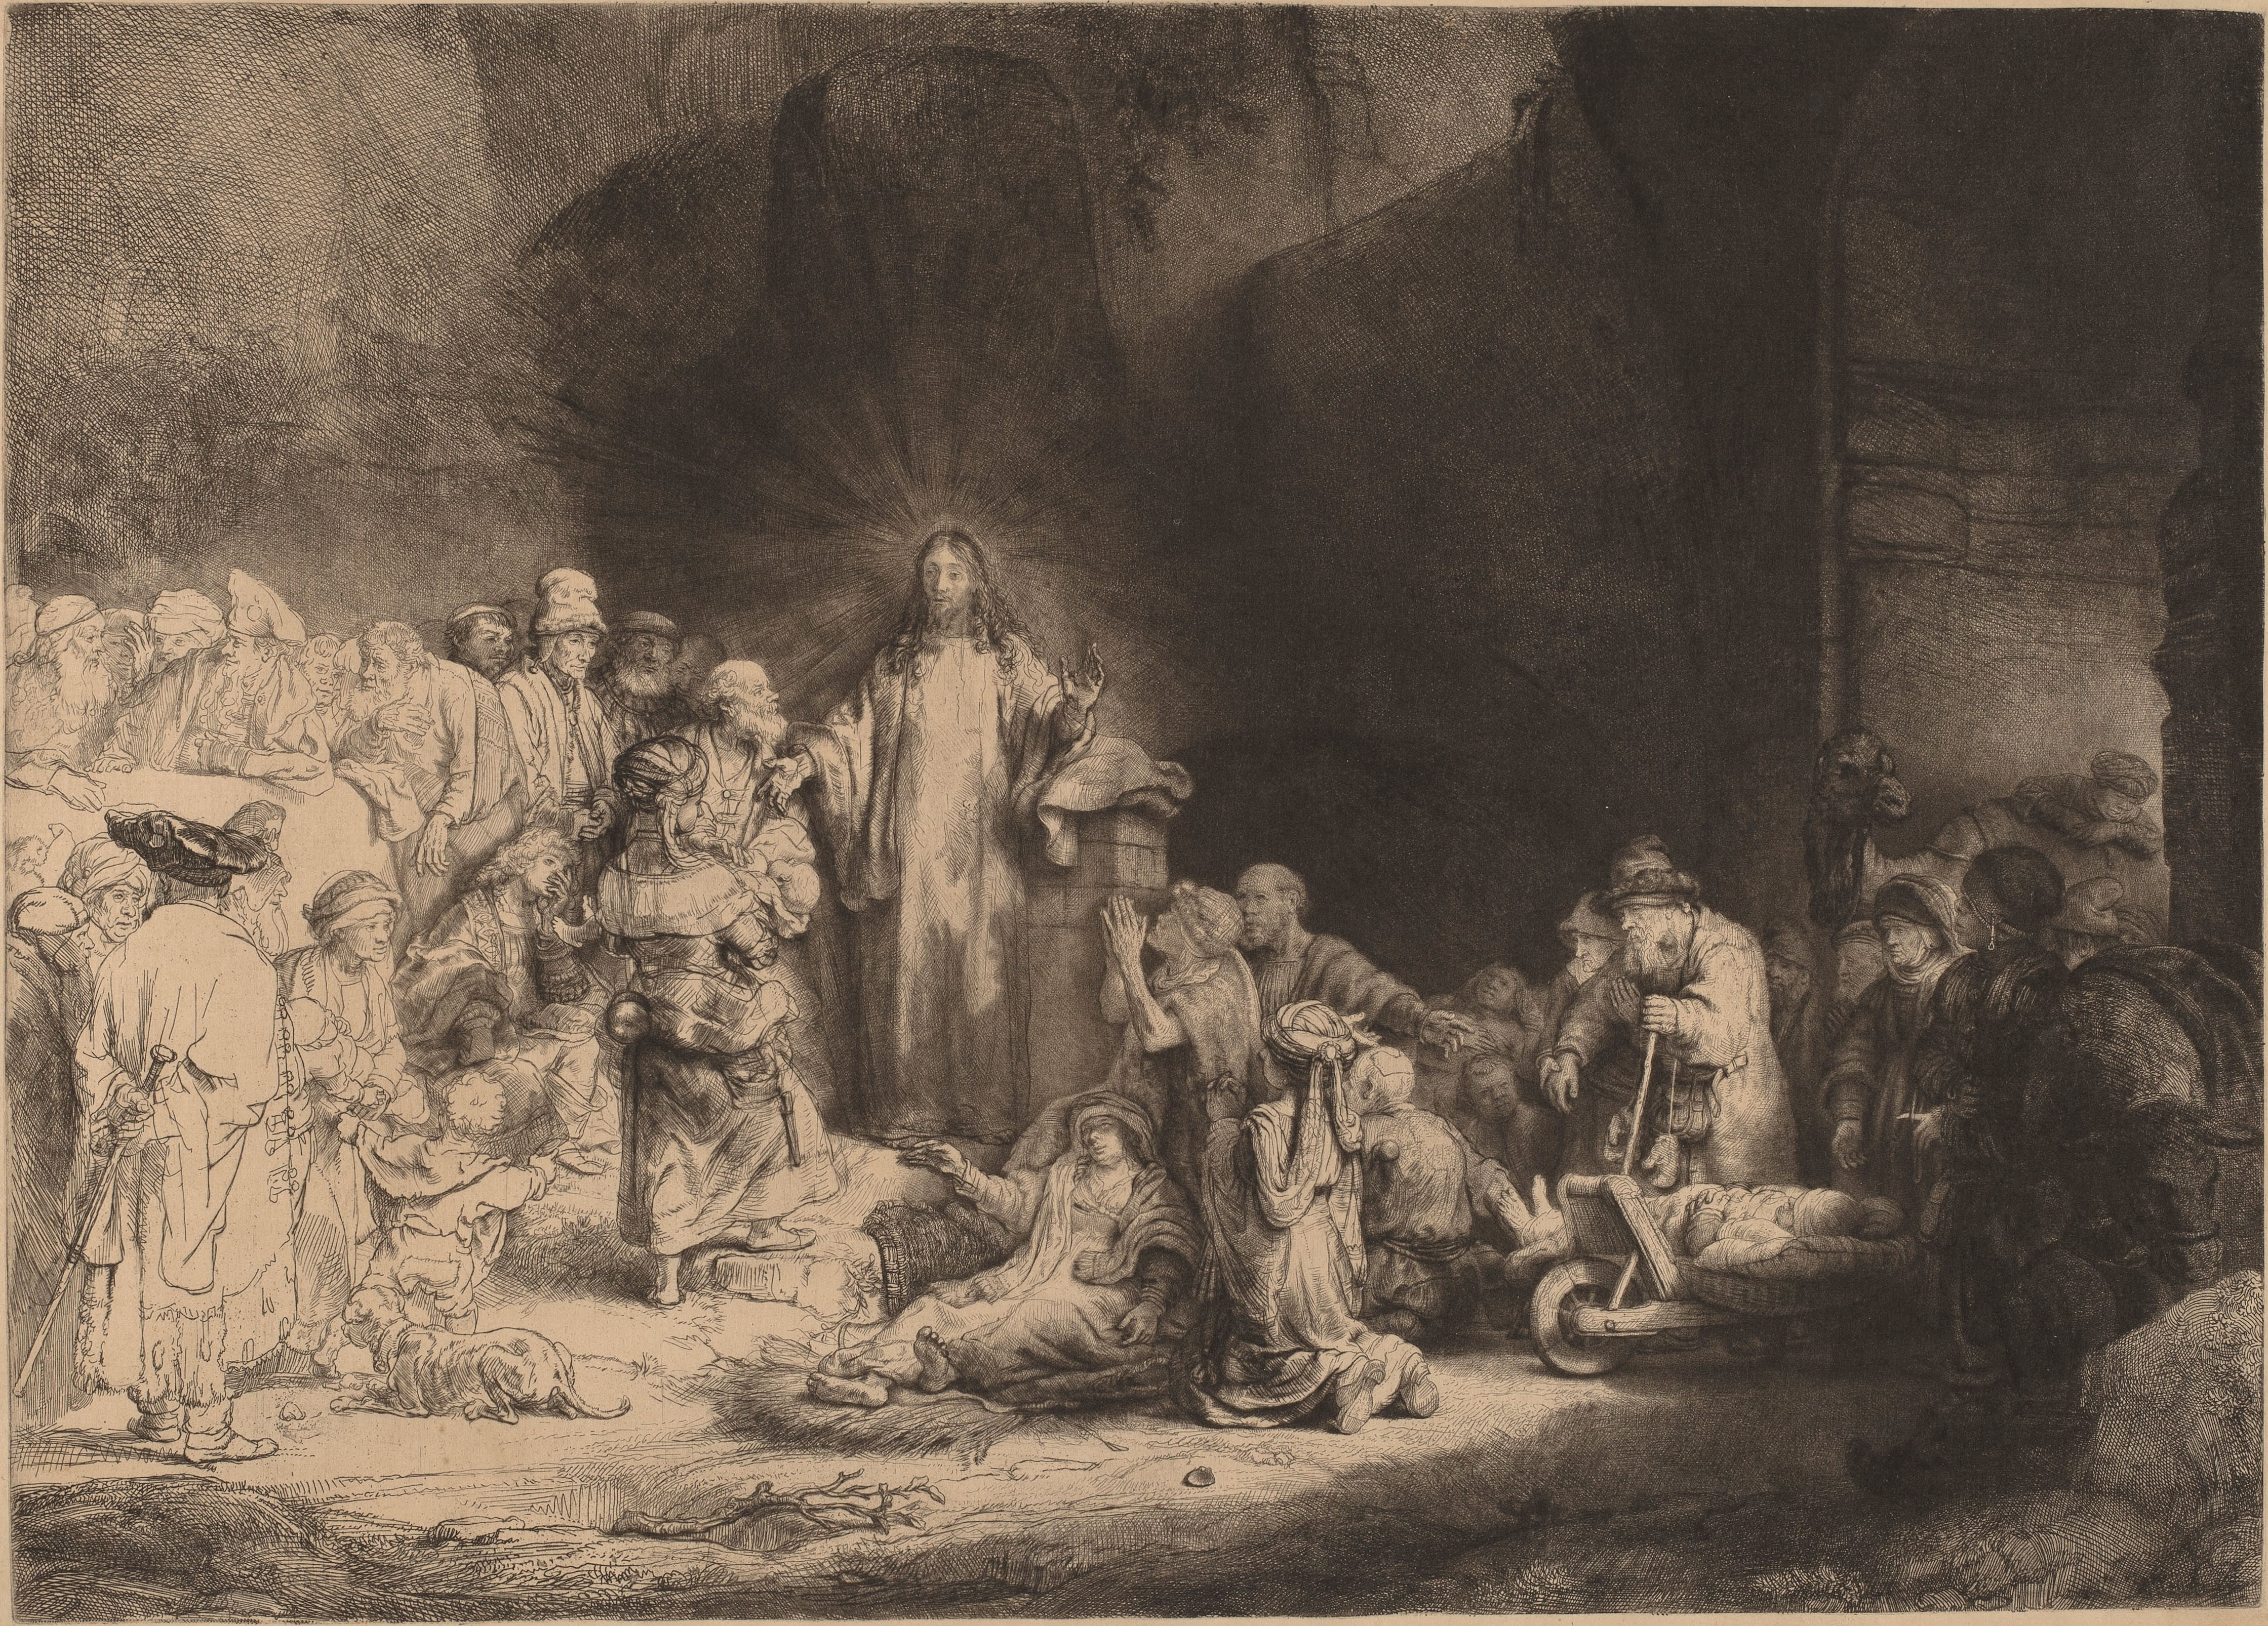 rembrandt_van_rijn_-_christ_preaching_the_hundred_guilder_print_-_google_art_project